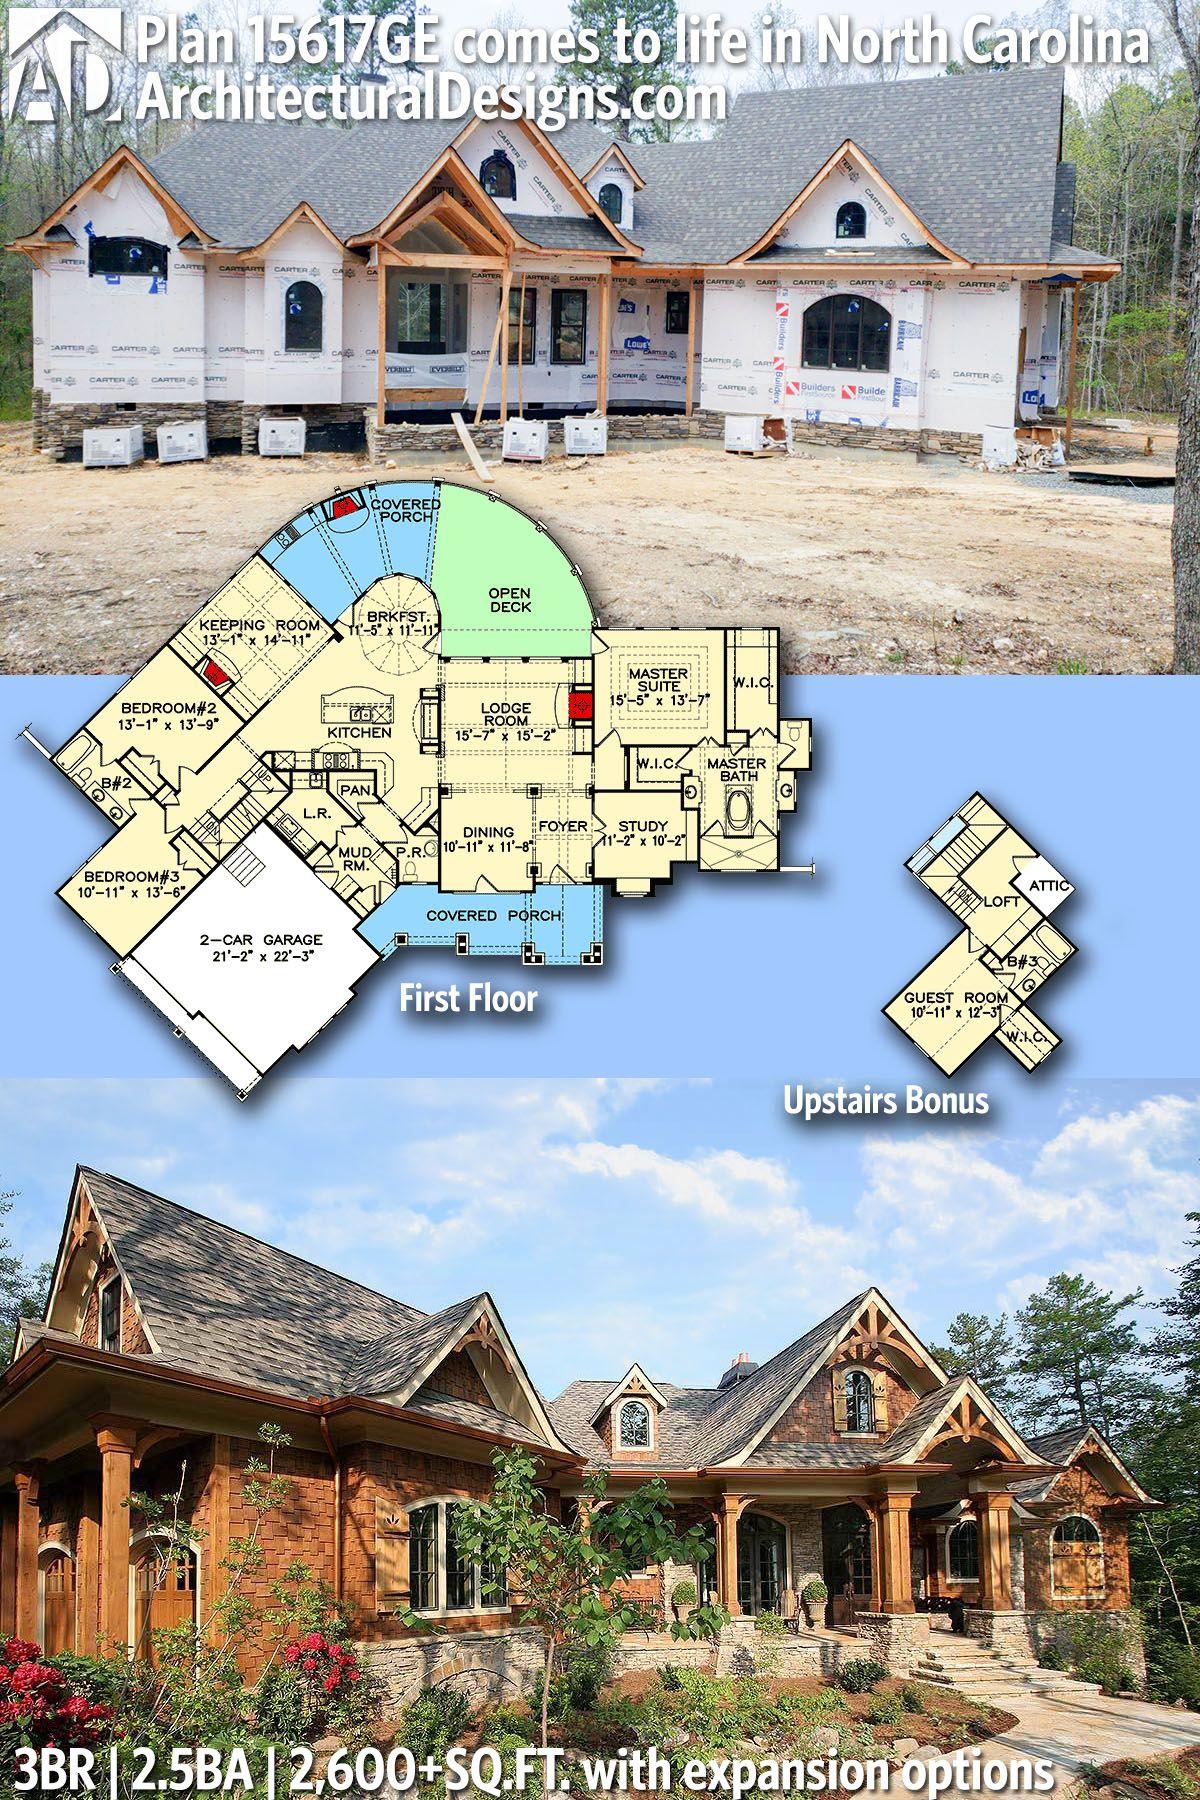 Architectural Designs House Plan 15617GE under construction